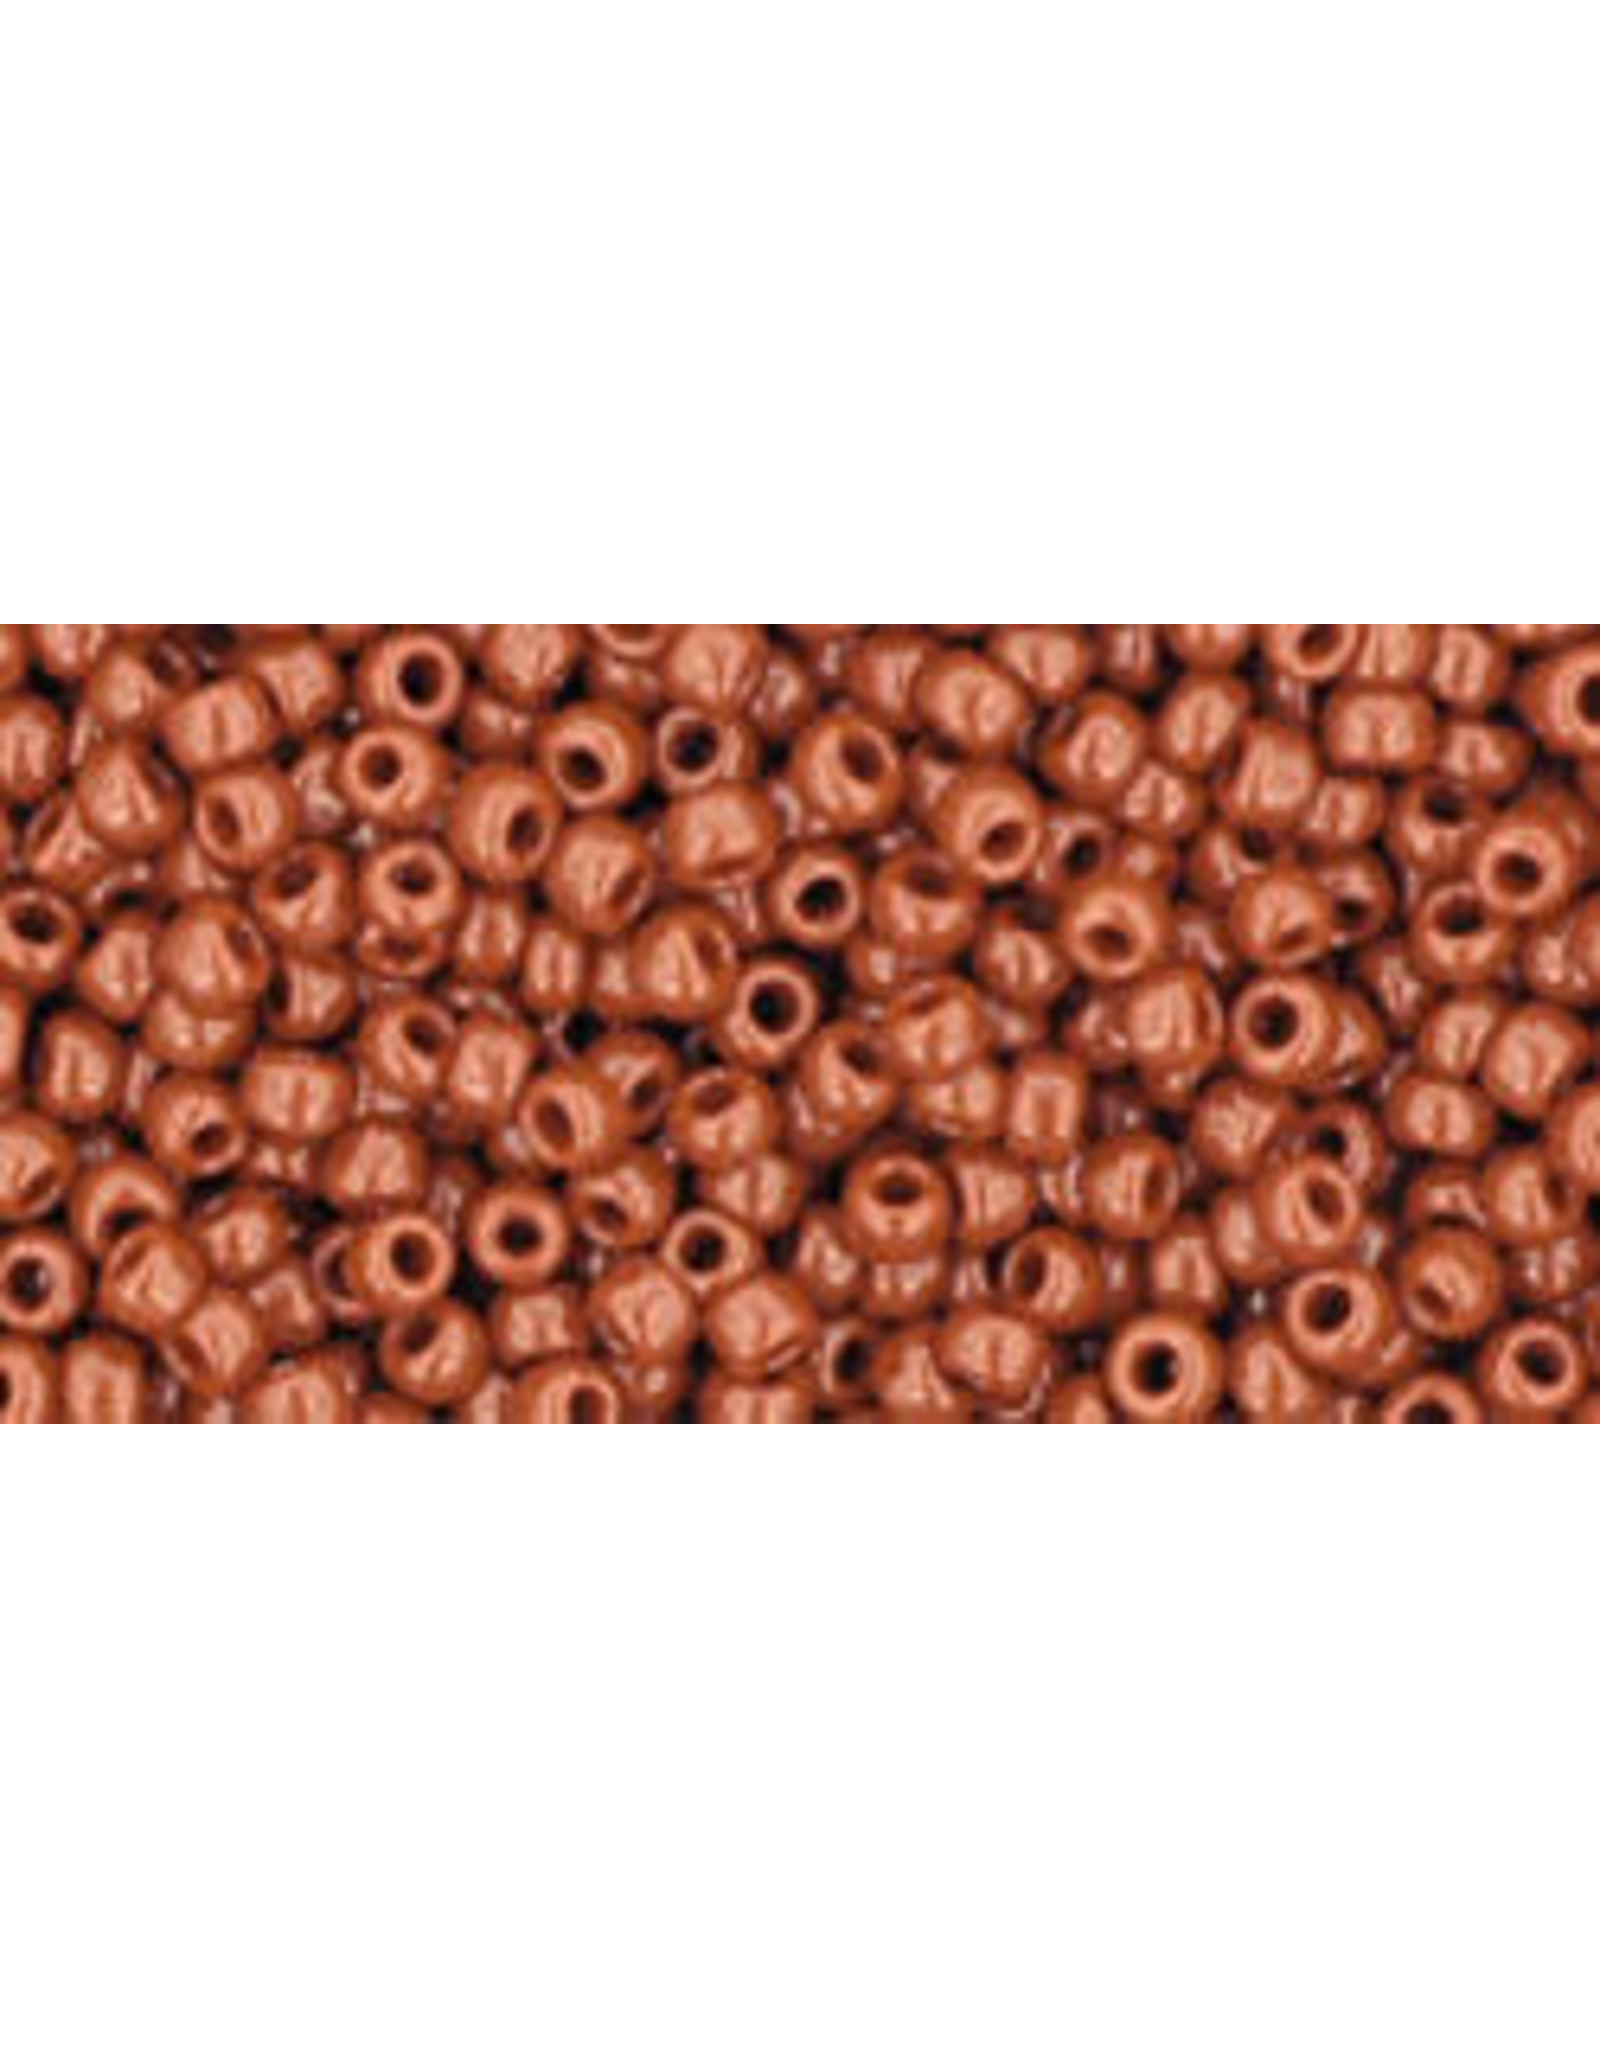 46L 11 Toho Round 6g Opaque Light Brown